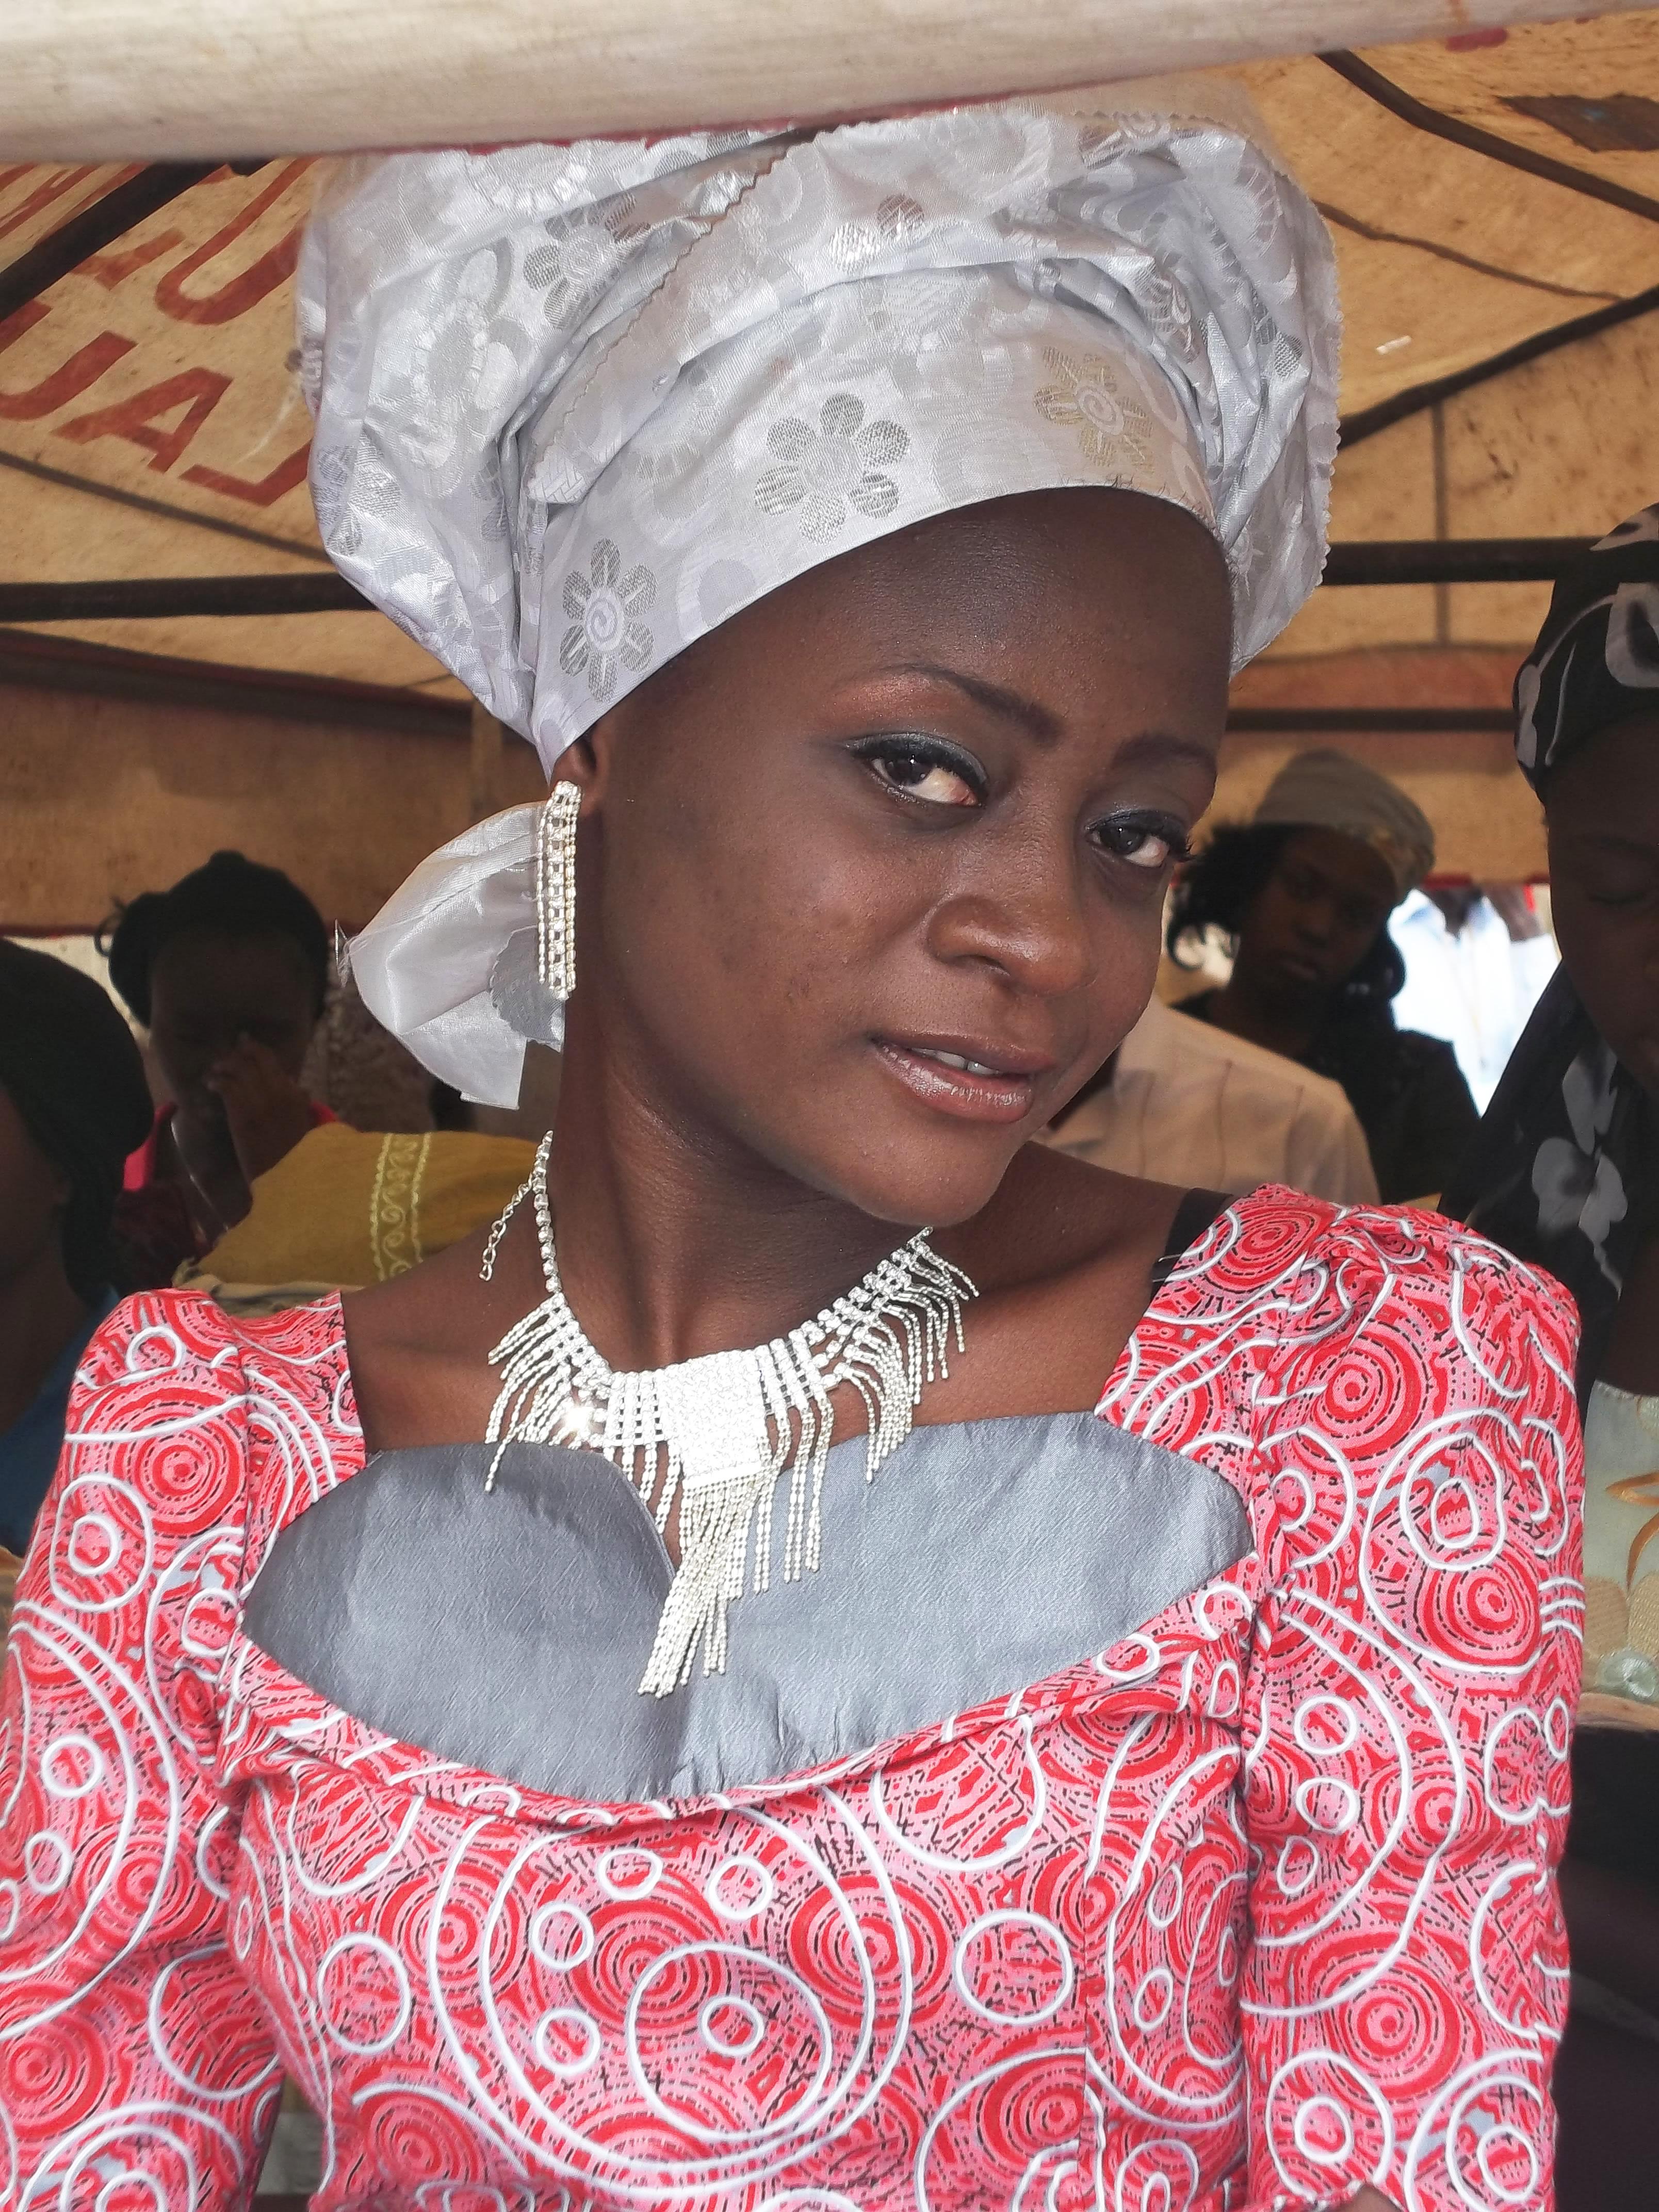 My girlfriend ebony